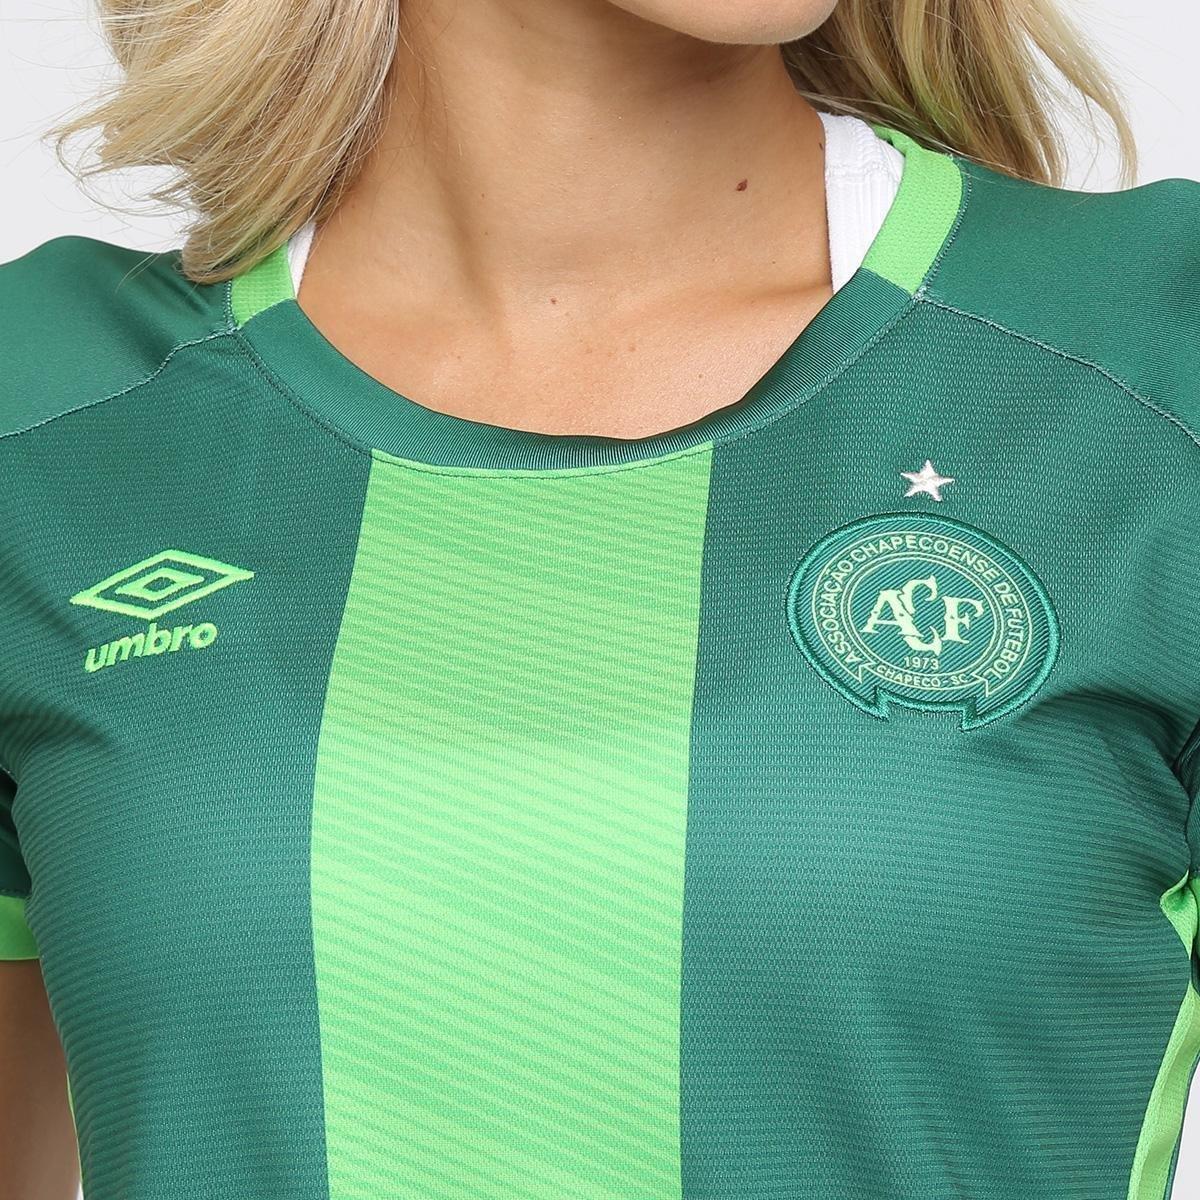 Verde Umbro s III 16 Feminina Torcedor Chapecoense nº 17 Camisa gwzqnxR0Hx